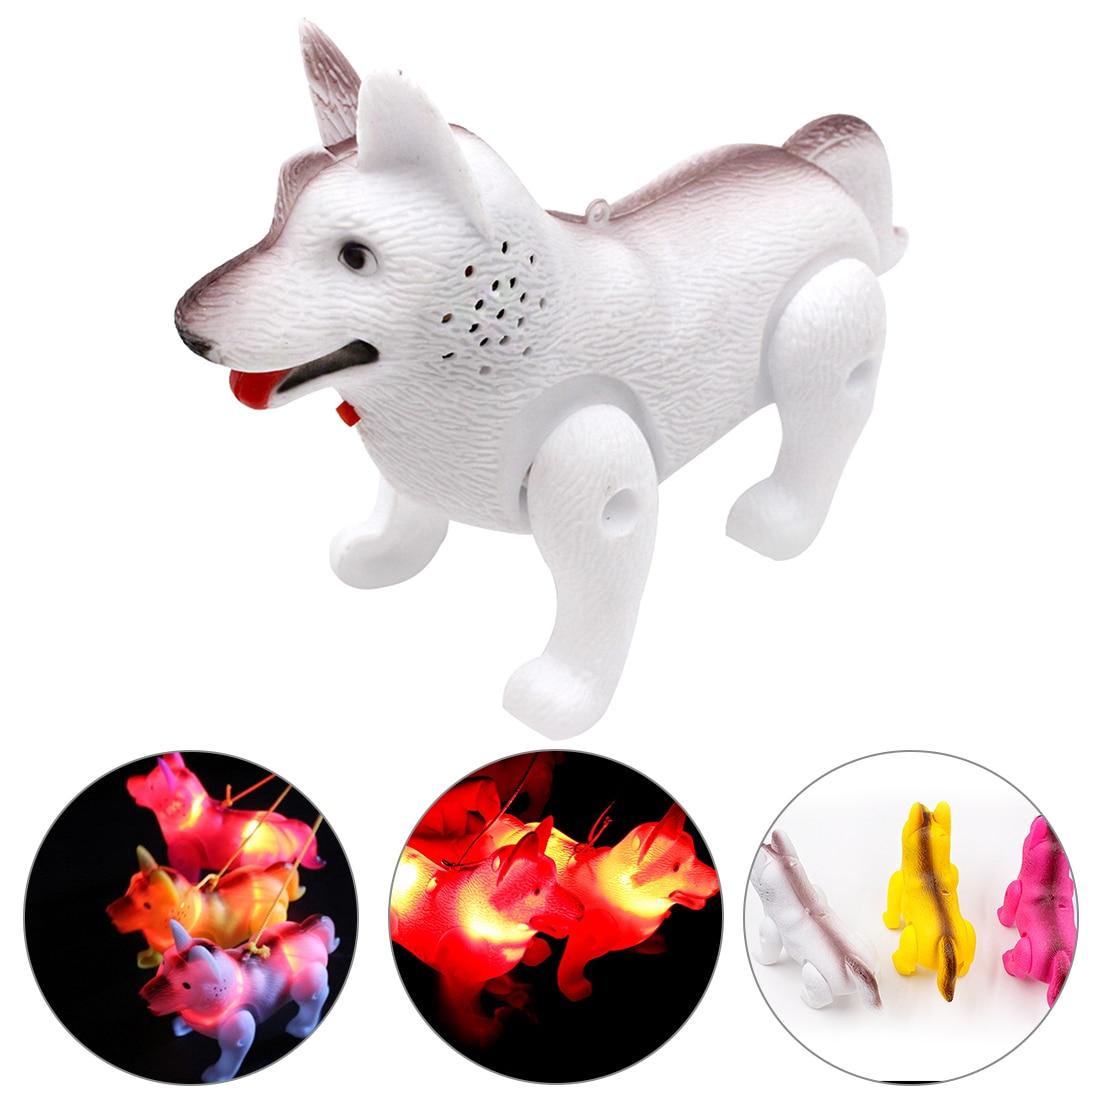 Electronic Pet Funny Robot Unicorn Children Toys LED Light Luminous Music Electric Walking Educational Toys For Kids Child Gift